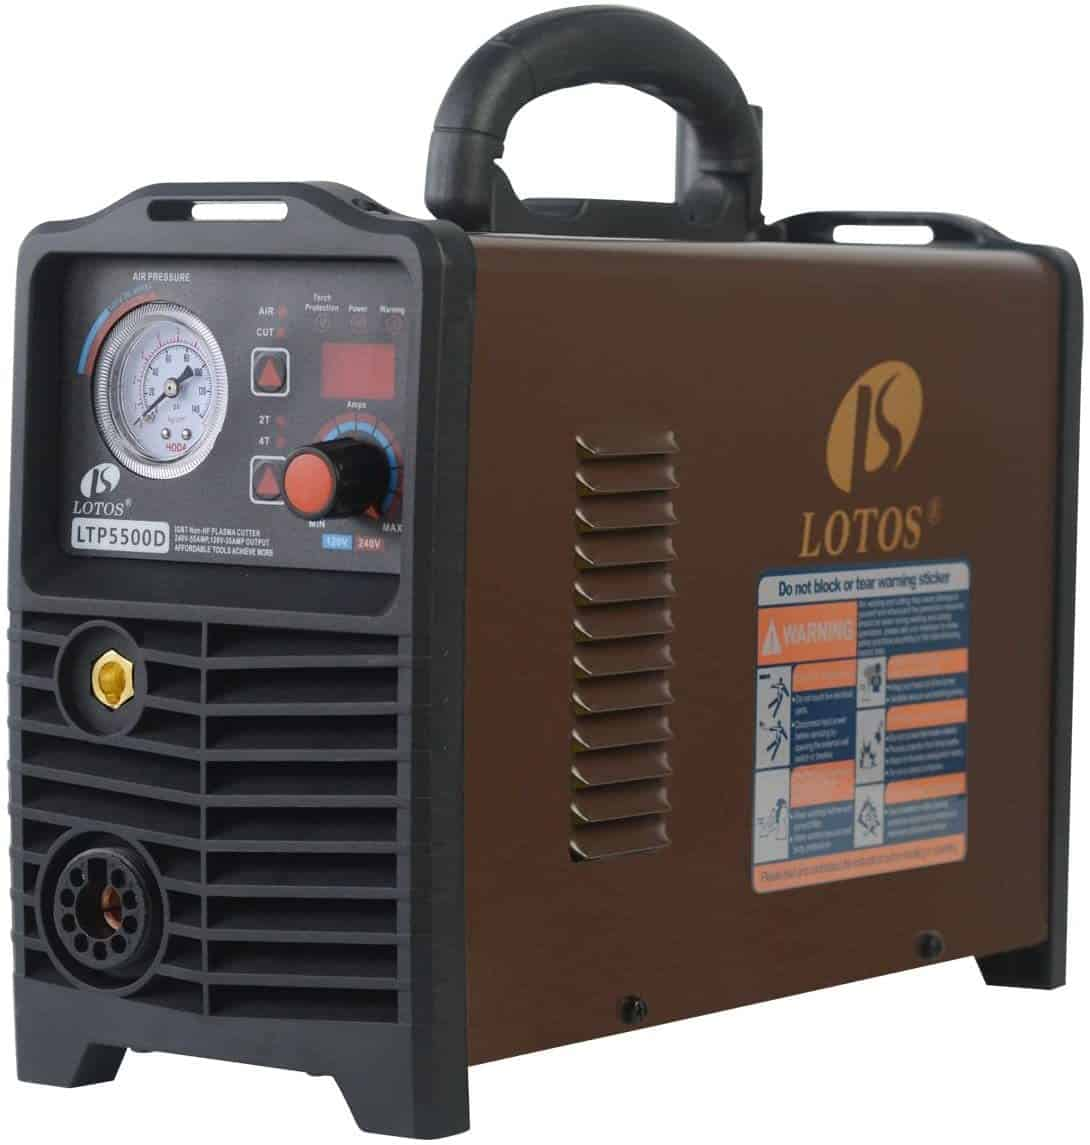 LOTOS LTP5500D Arc Plasma Cutter